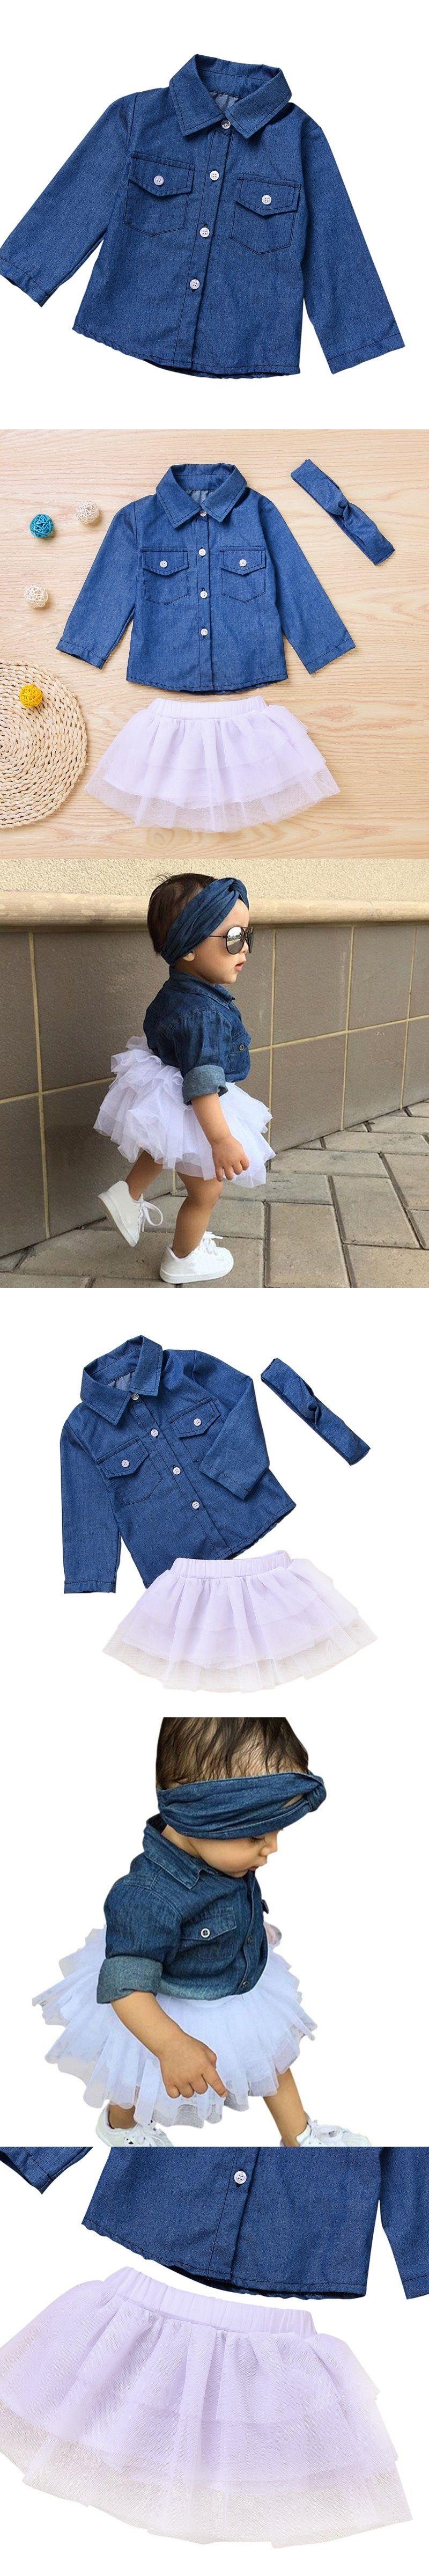 831cbffbaae 3PCS Toddler Kids Baby Girl Clothes Set Denim Tops T-shirt +Tutu Skirt  Headband